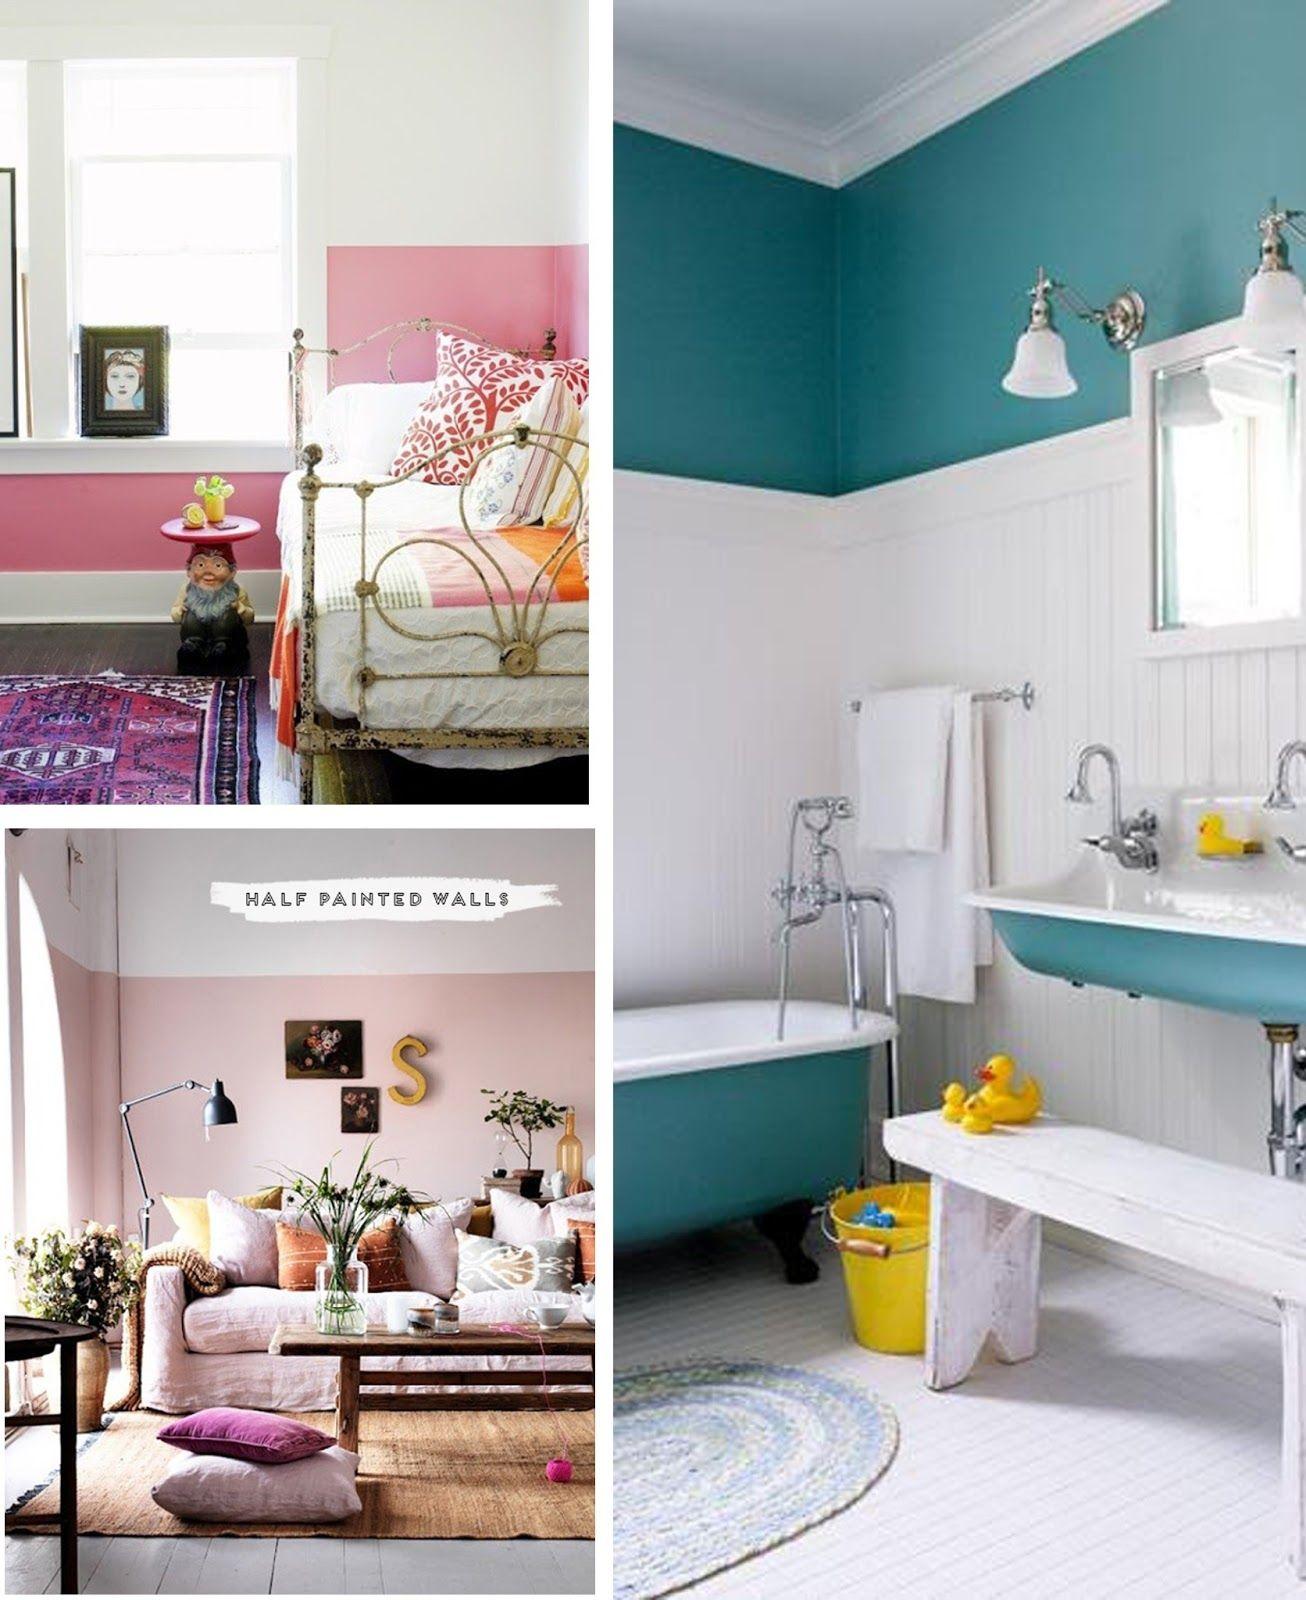 Pintura paredes colores homepersonalshopper - Colores de pintura para paredes de dormitorios ...